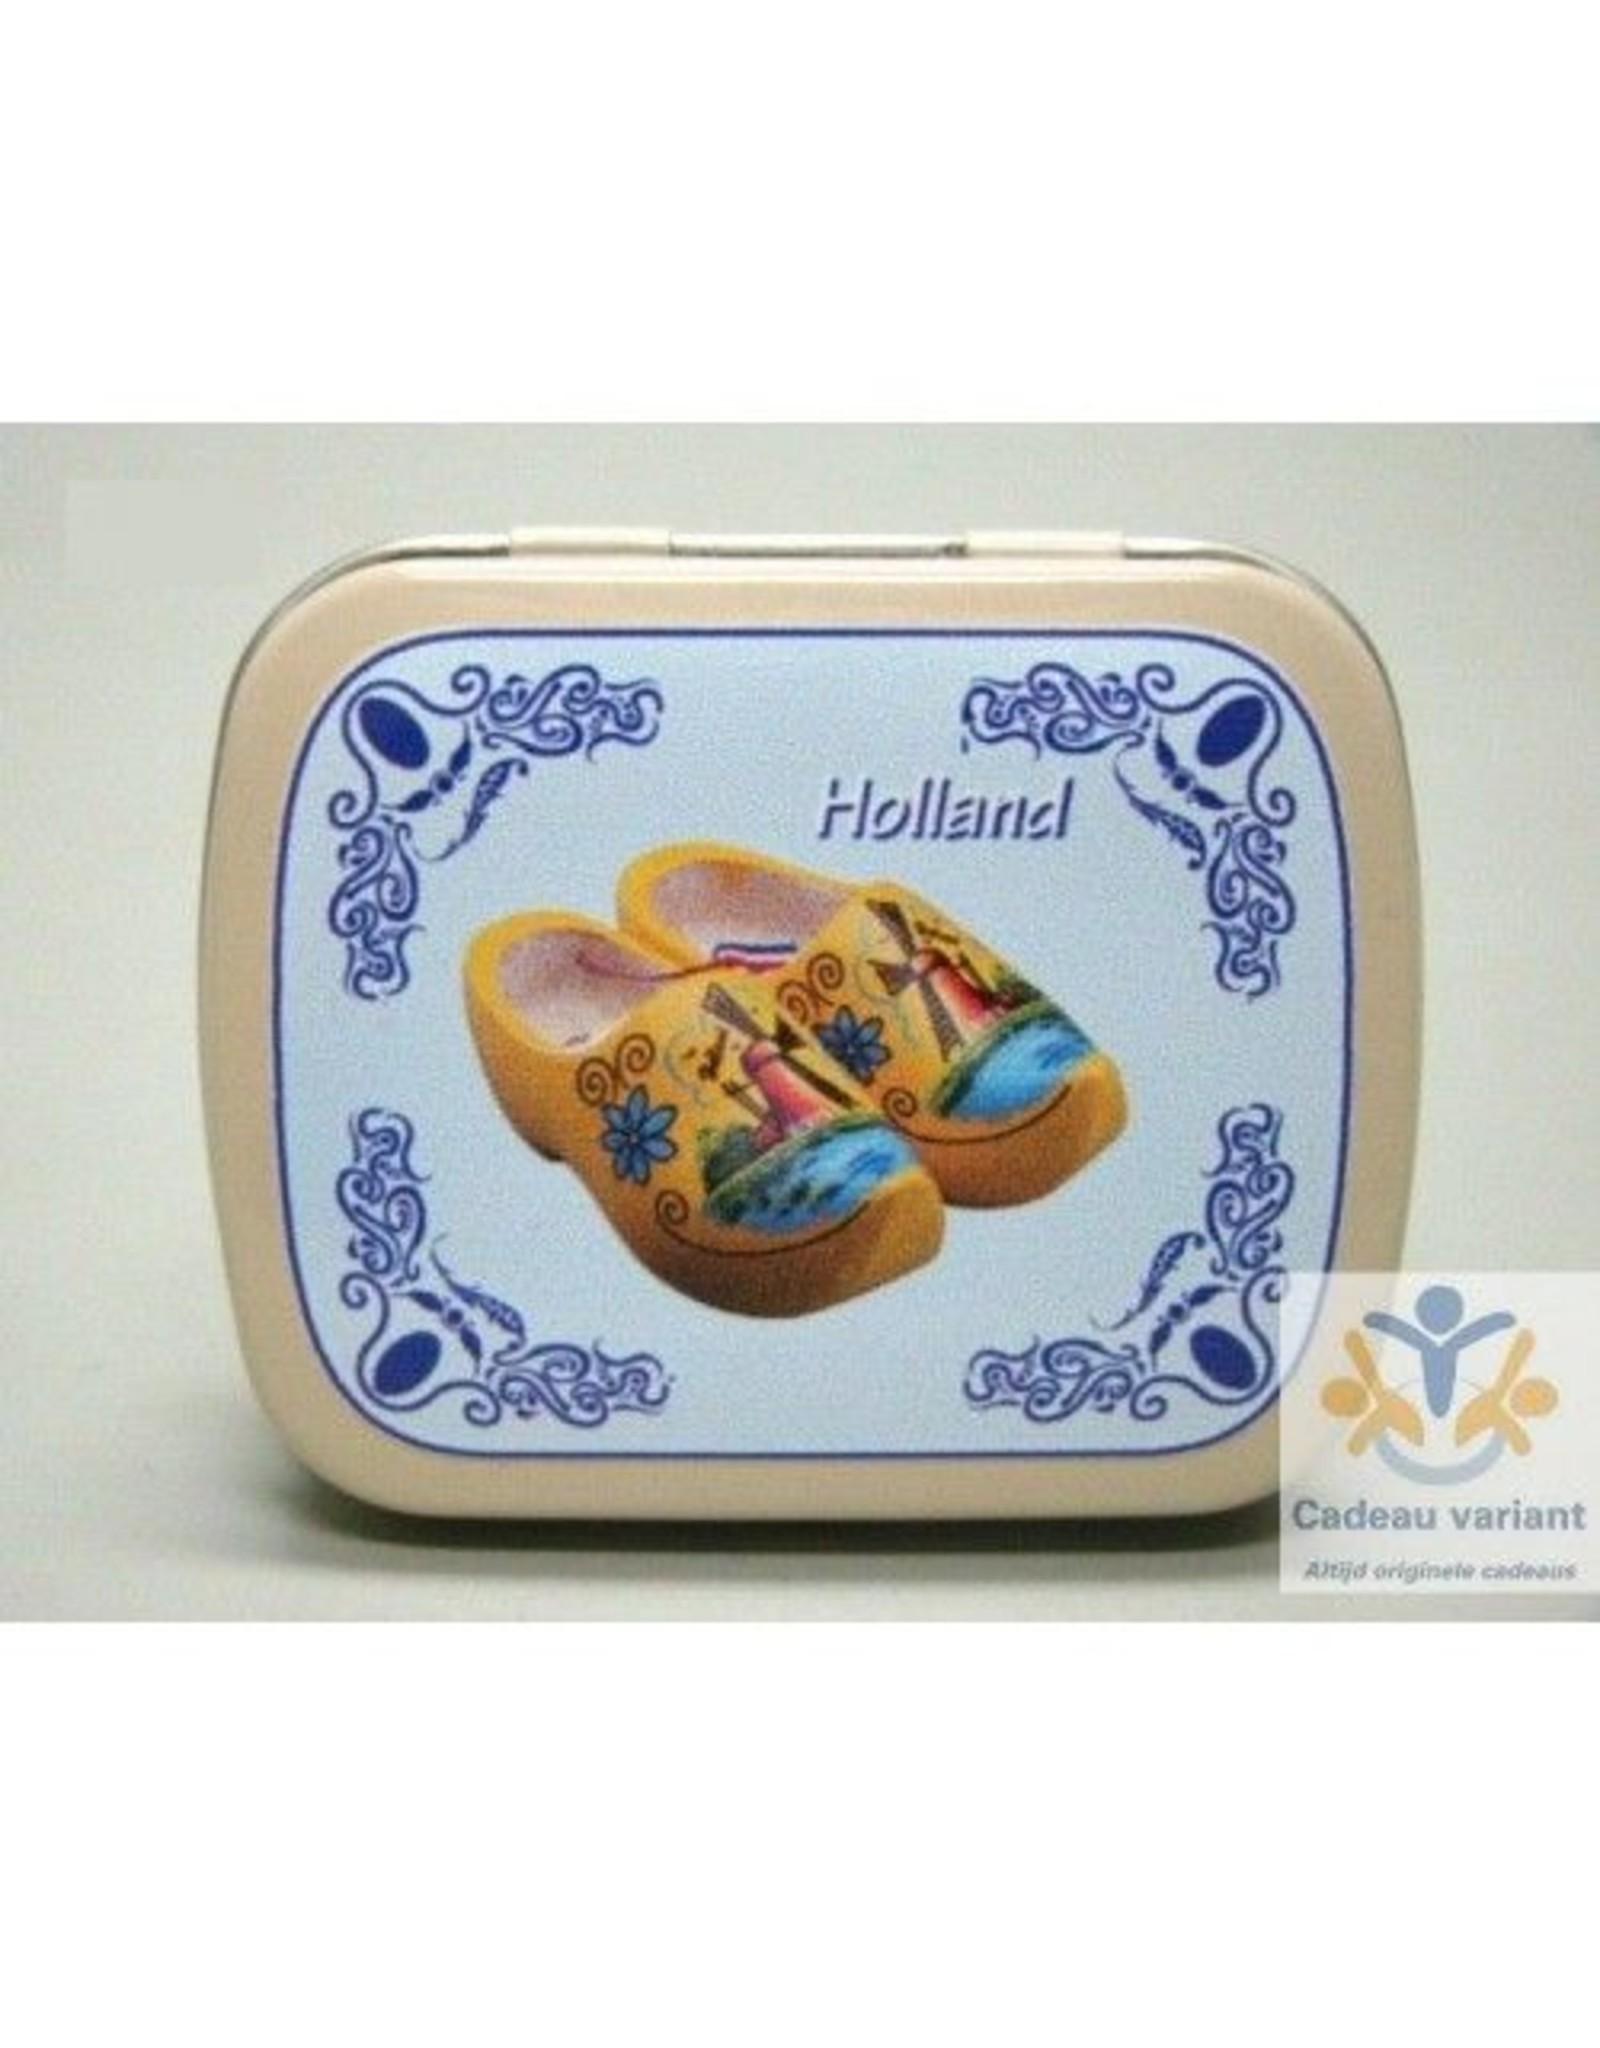 Klompen Holland pepermunt pillendoosje